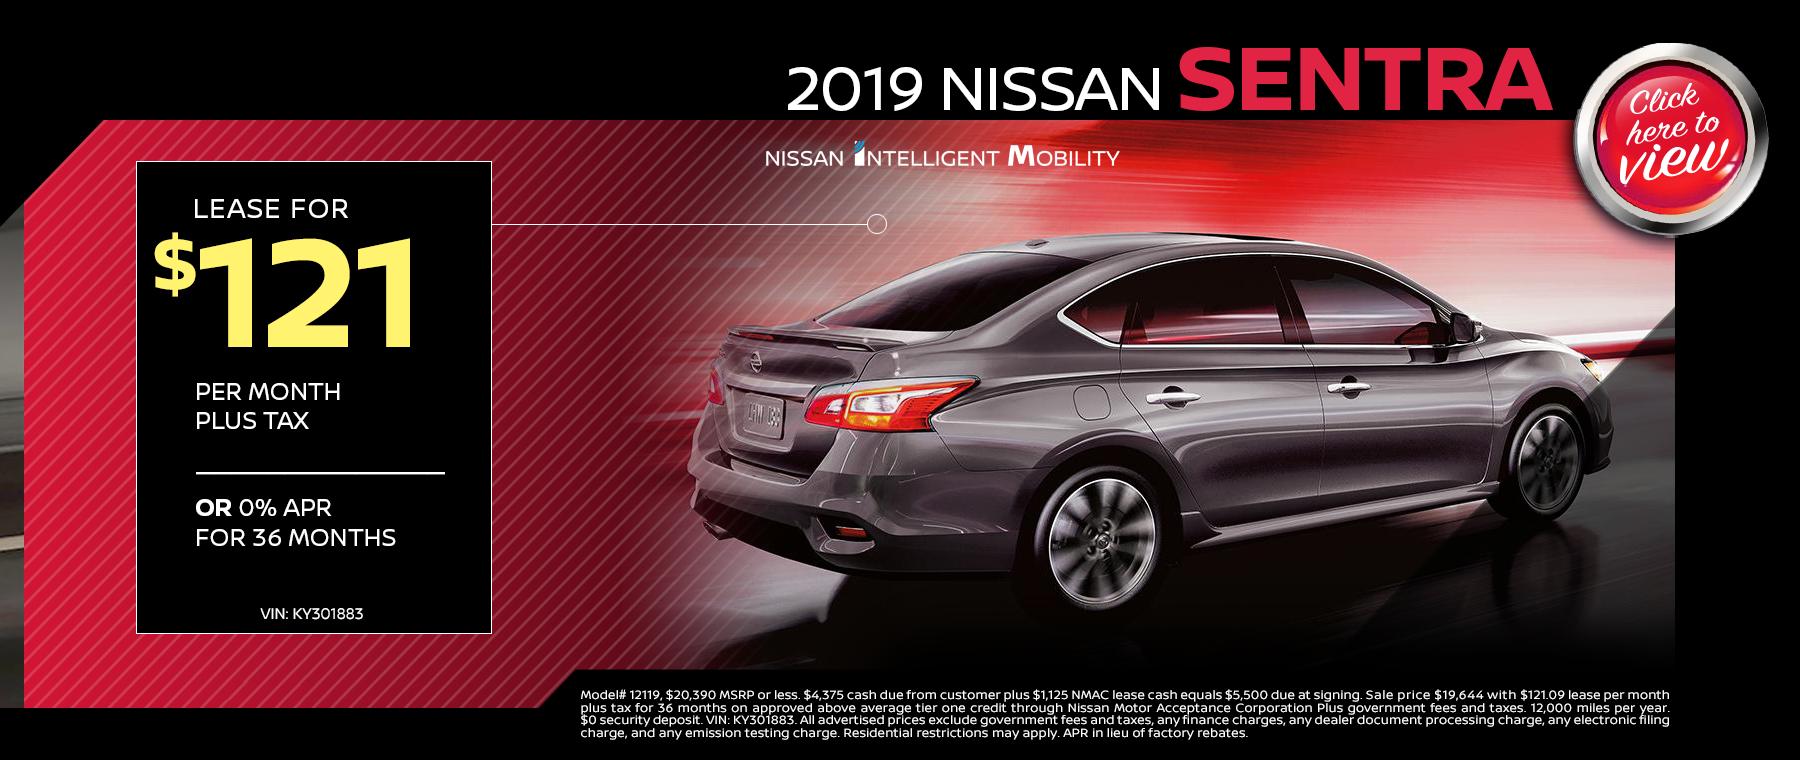 2019 sentra lease specials